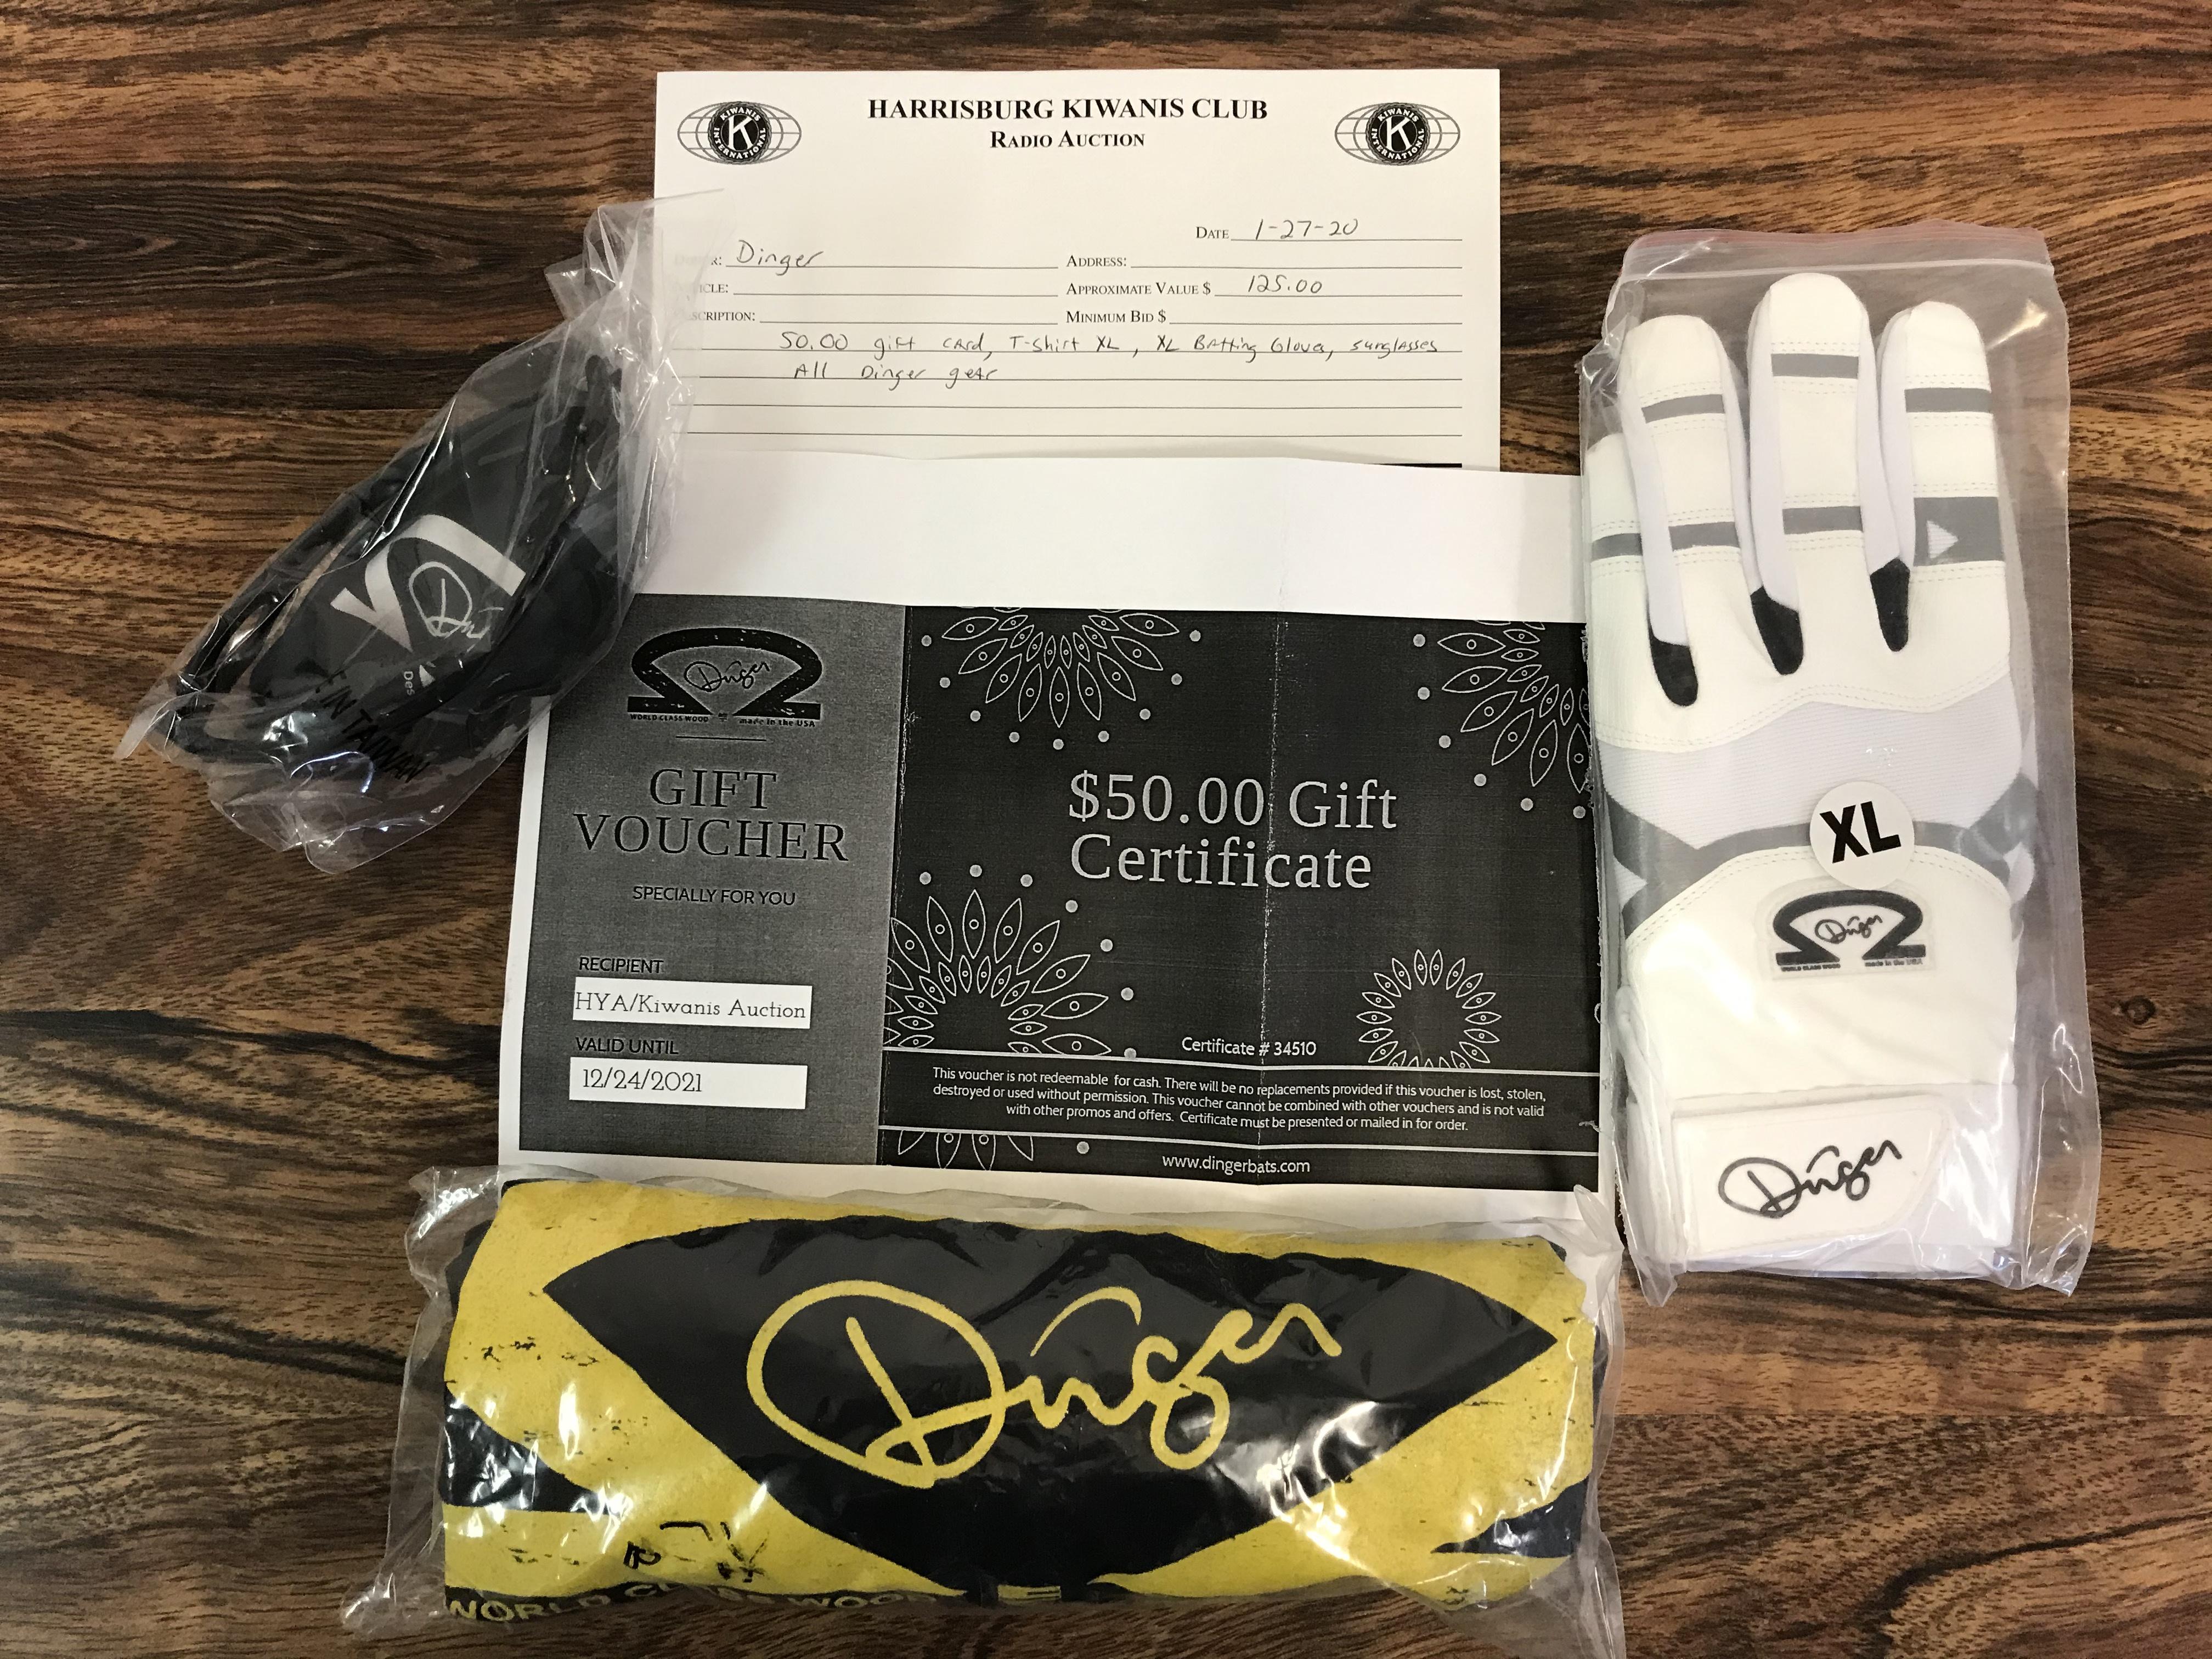 Item 334 - Dinger $50 Gift Card, Dinger Gear XL T-Shirt, XL Batting Gloves, Sunglasses